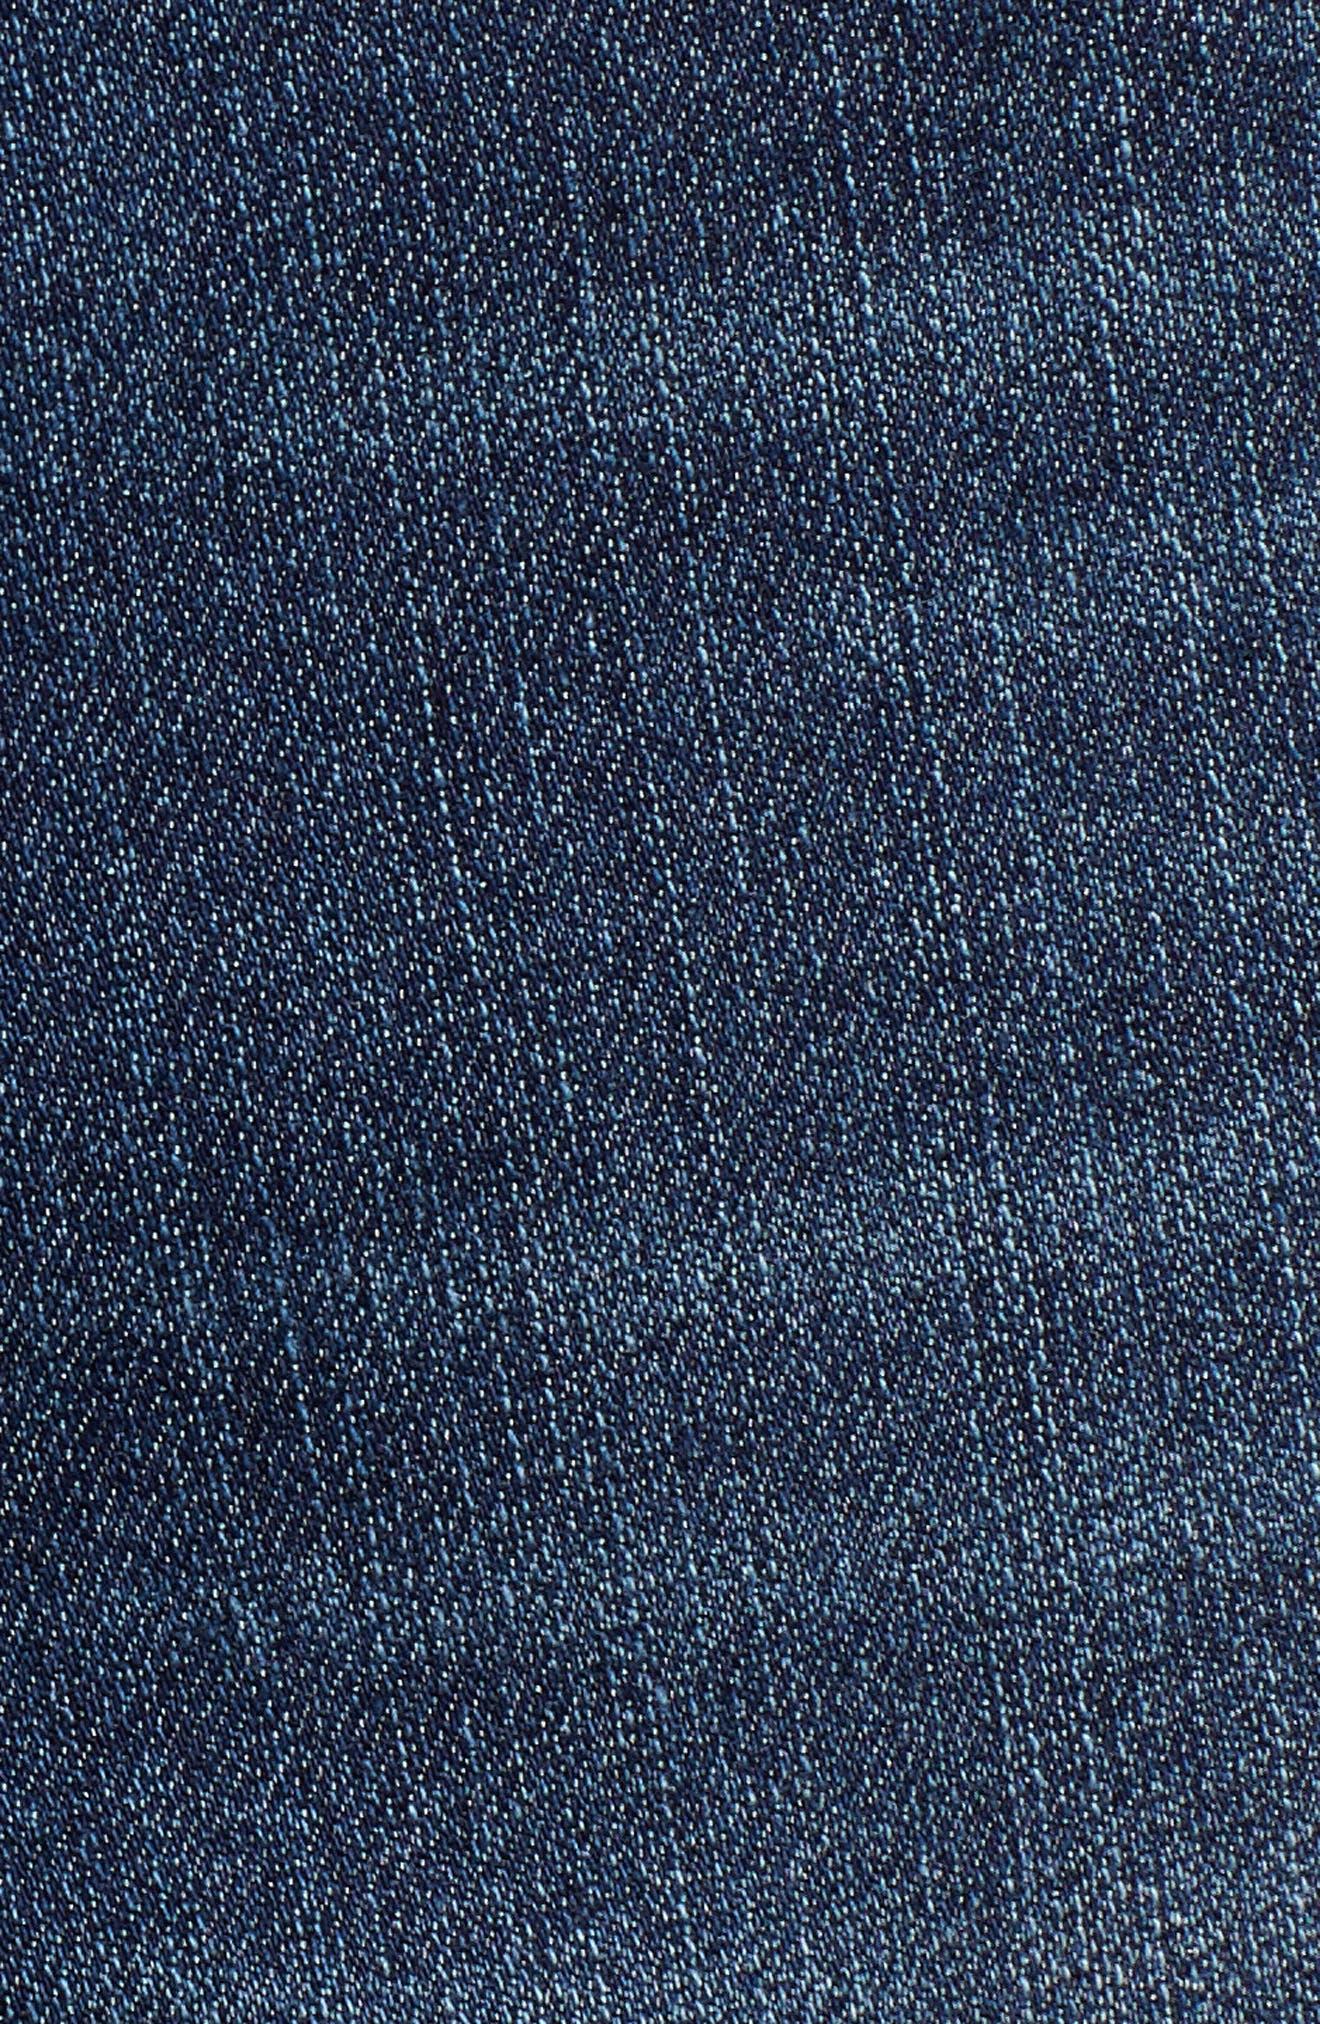 Side Slit Cutoff Denim Shorts,                             Alternate thumbnail 6, color,                             400